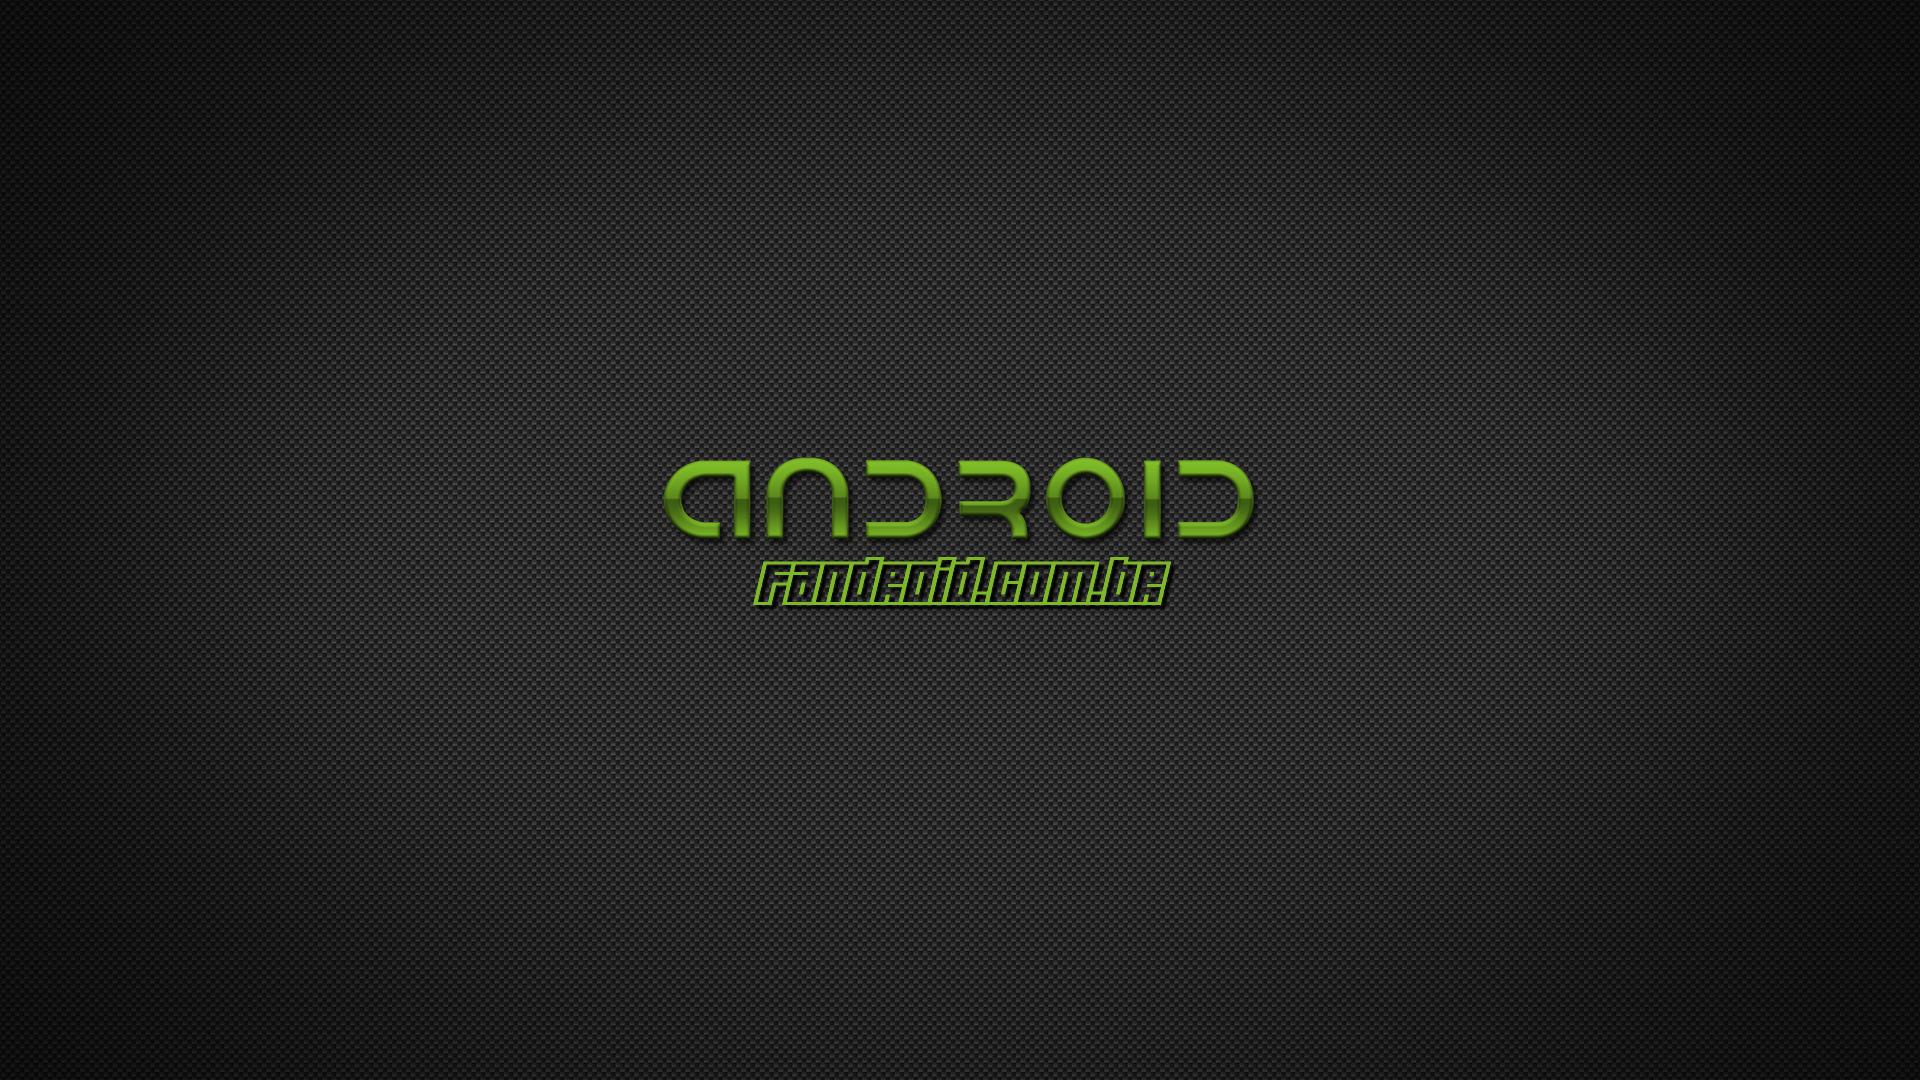 Carbon Android Jpg Oficial Fandroid Autor Sergio 1381664 Wallpaper wallpaper